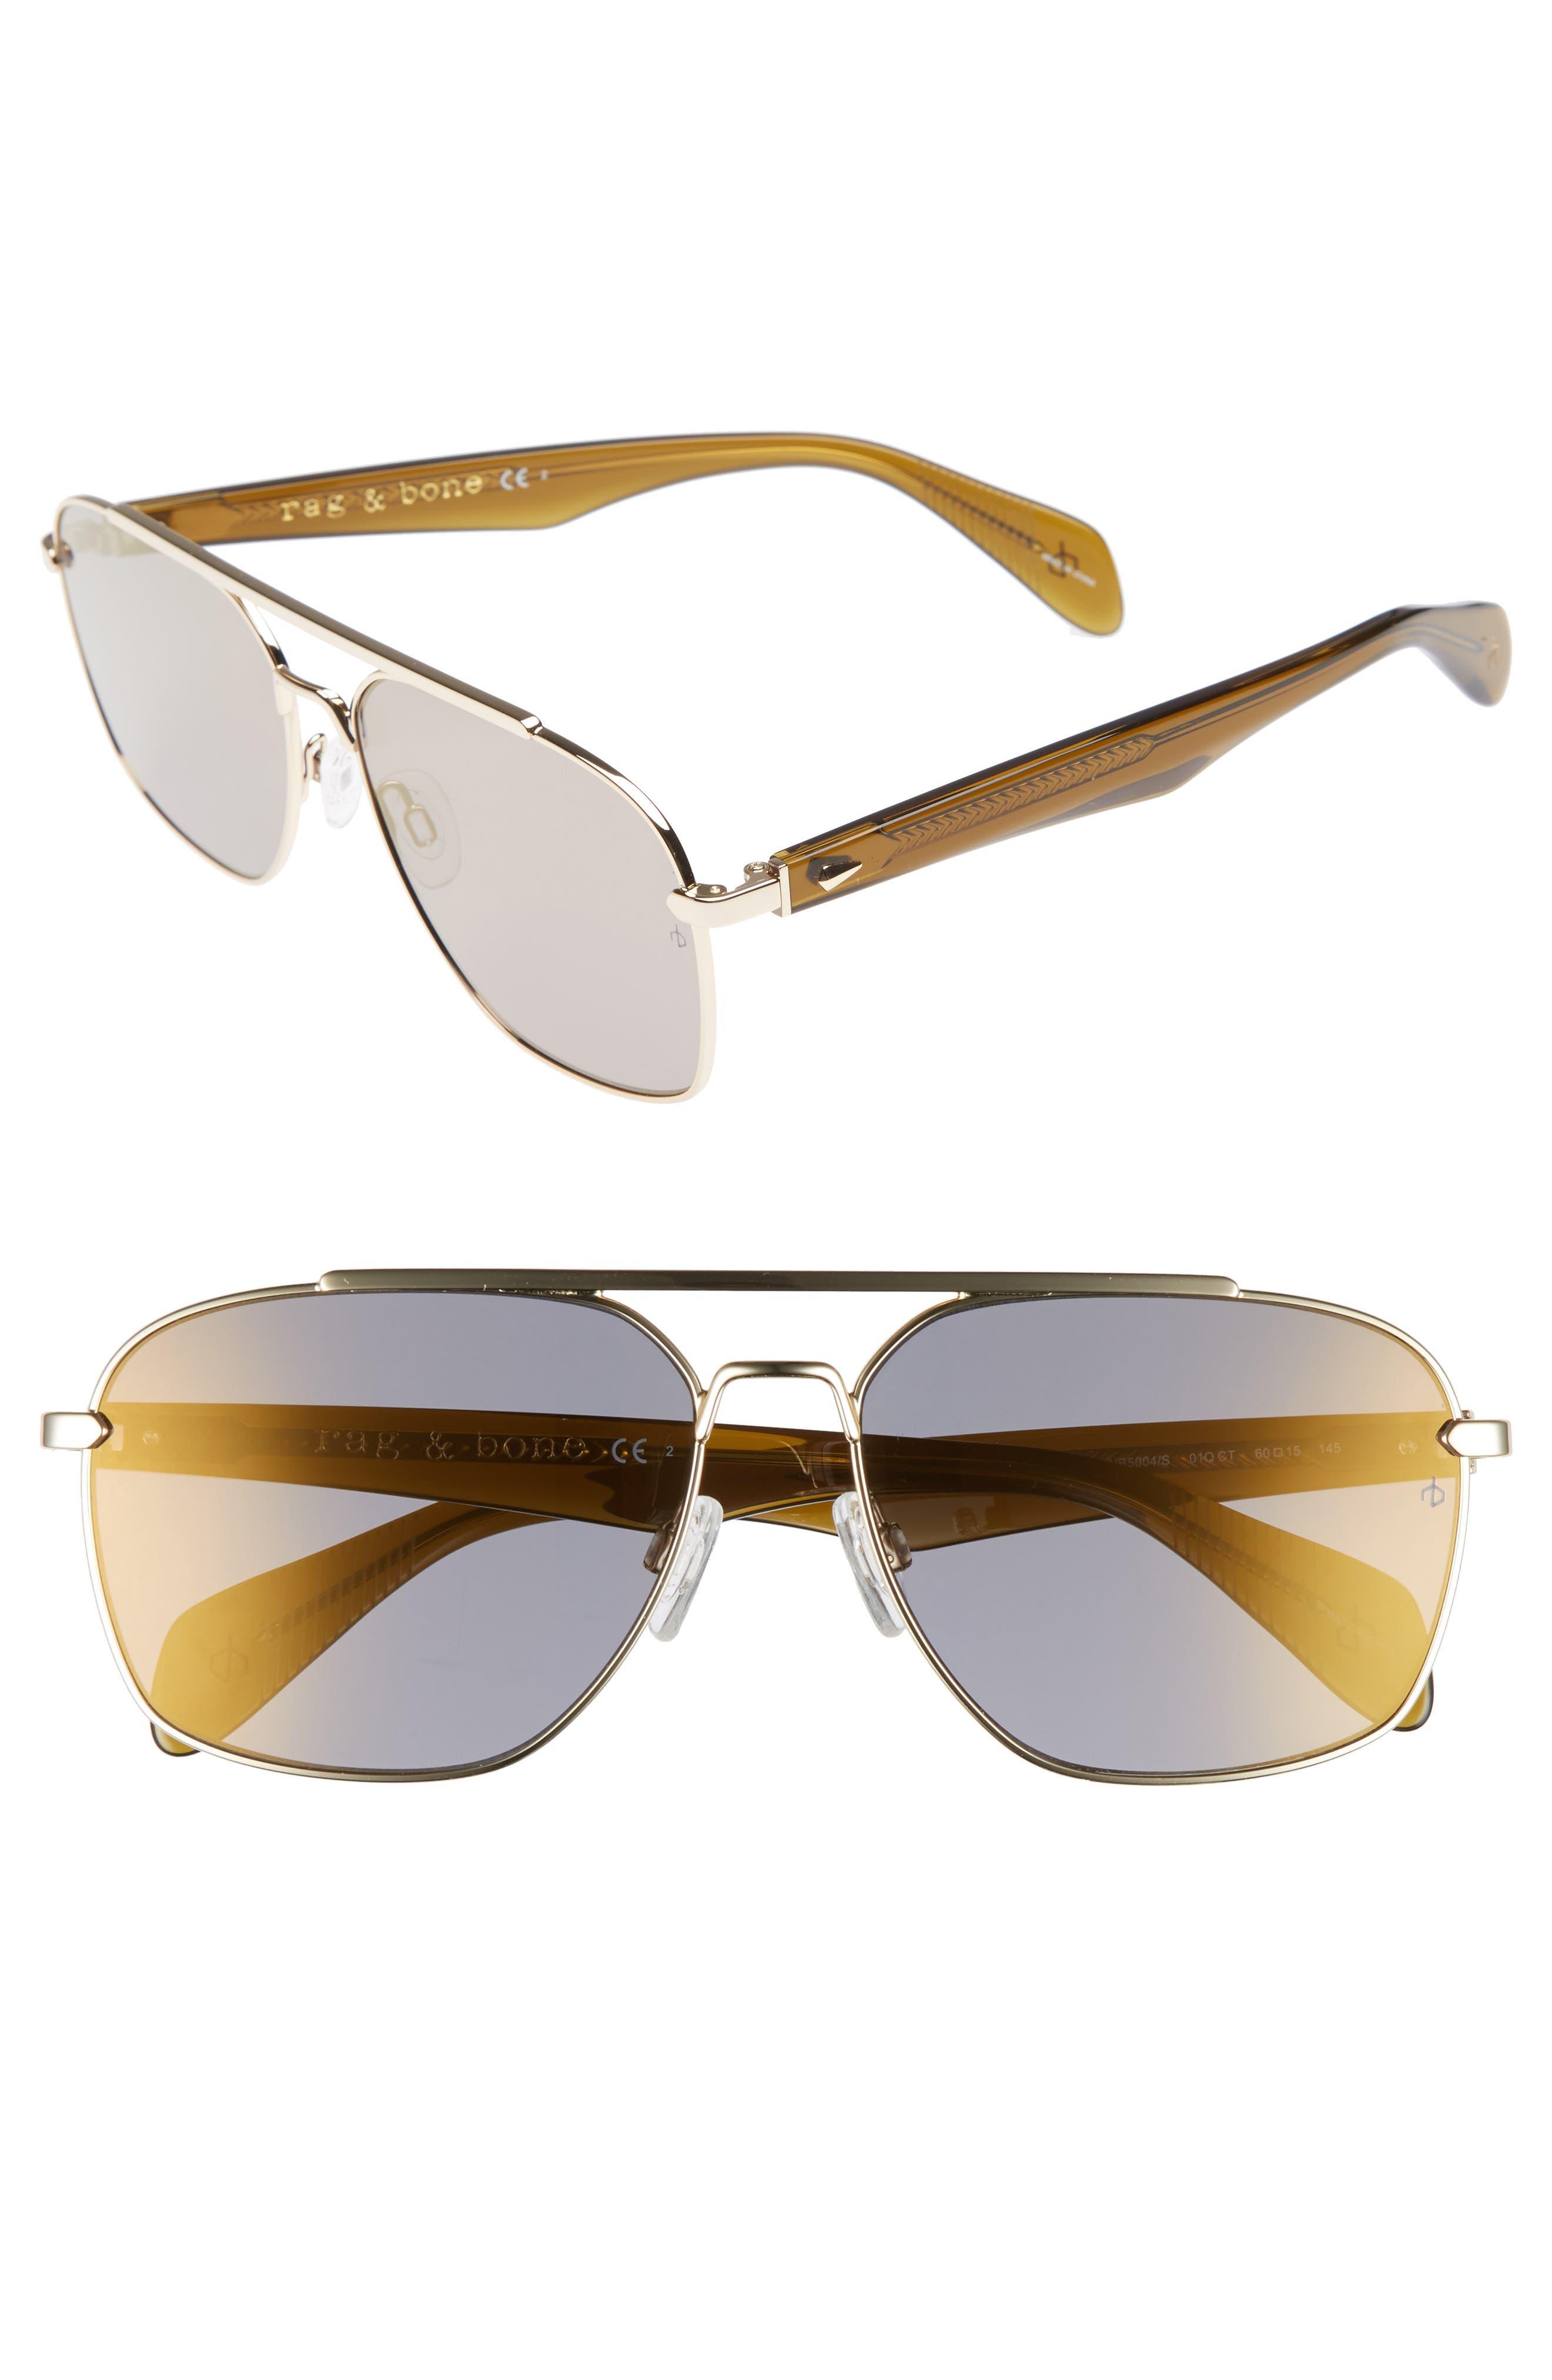 60mm Navigator Sunglasses,                         Main,                         color, 710